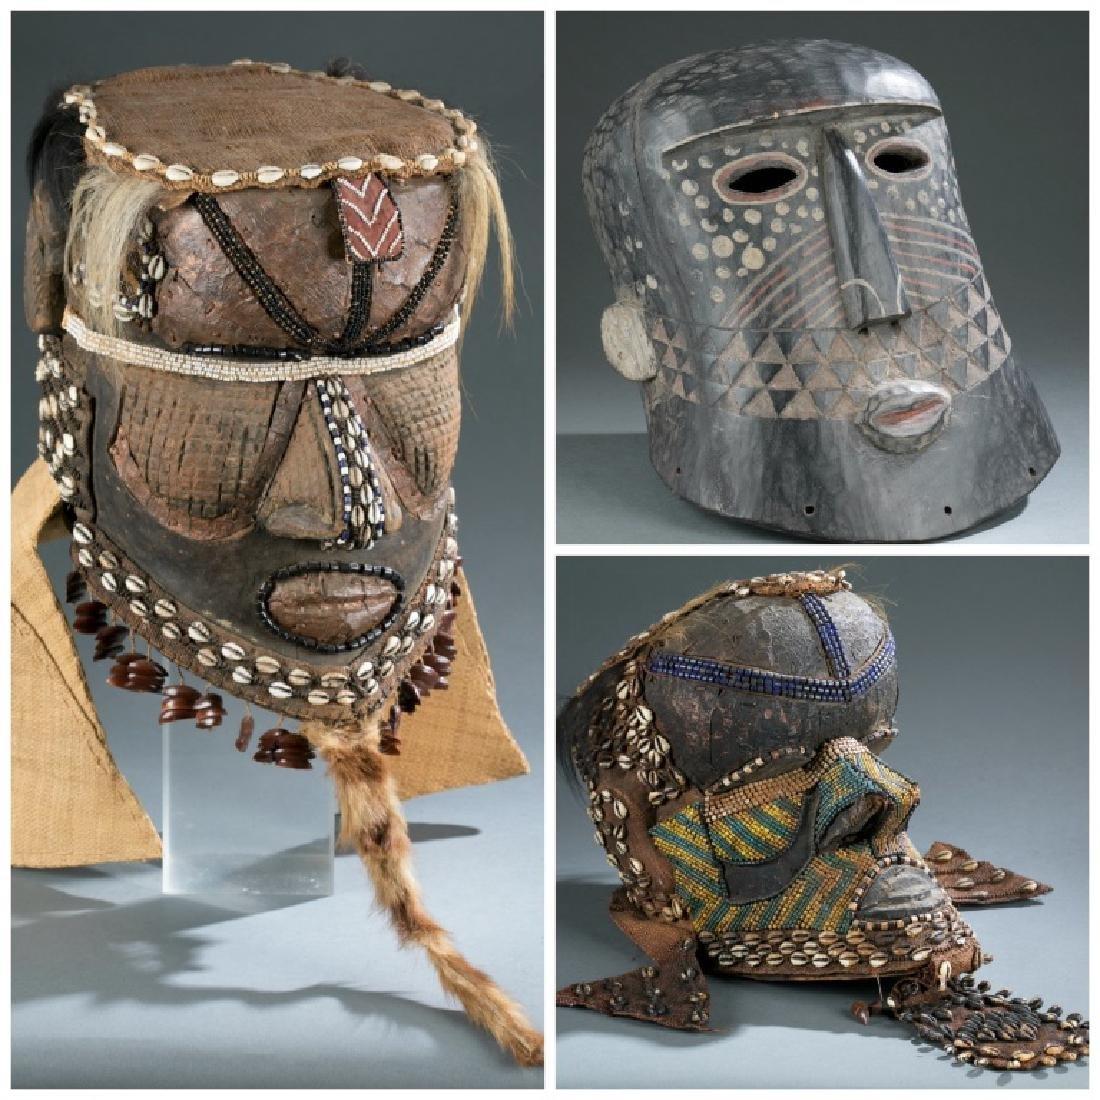 3 Kuba style helmet masks. c.20th century.